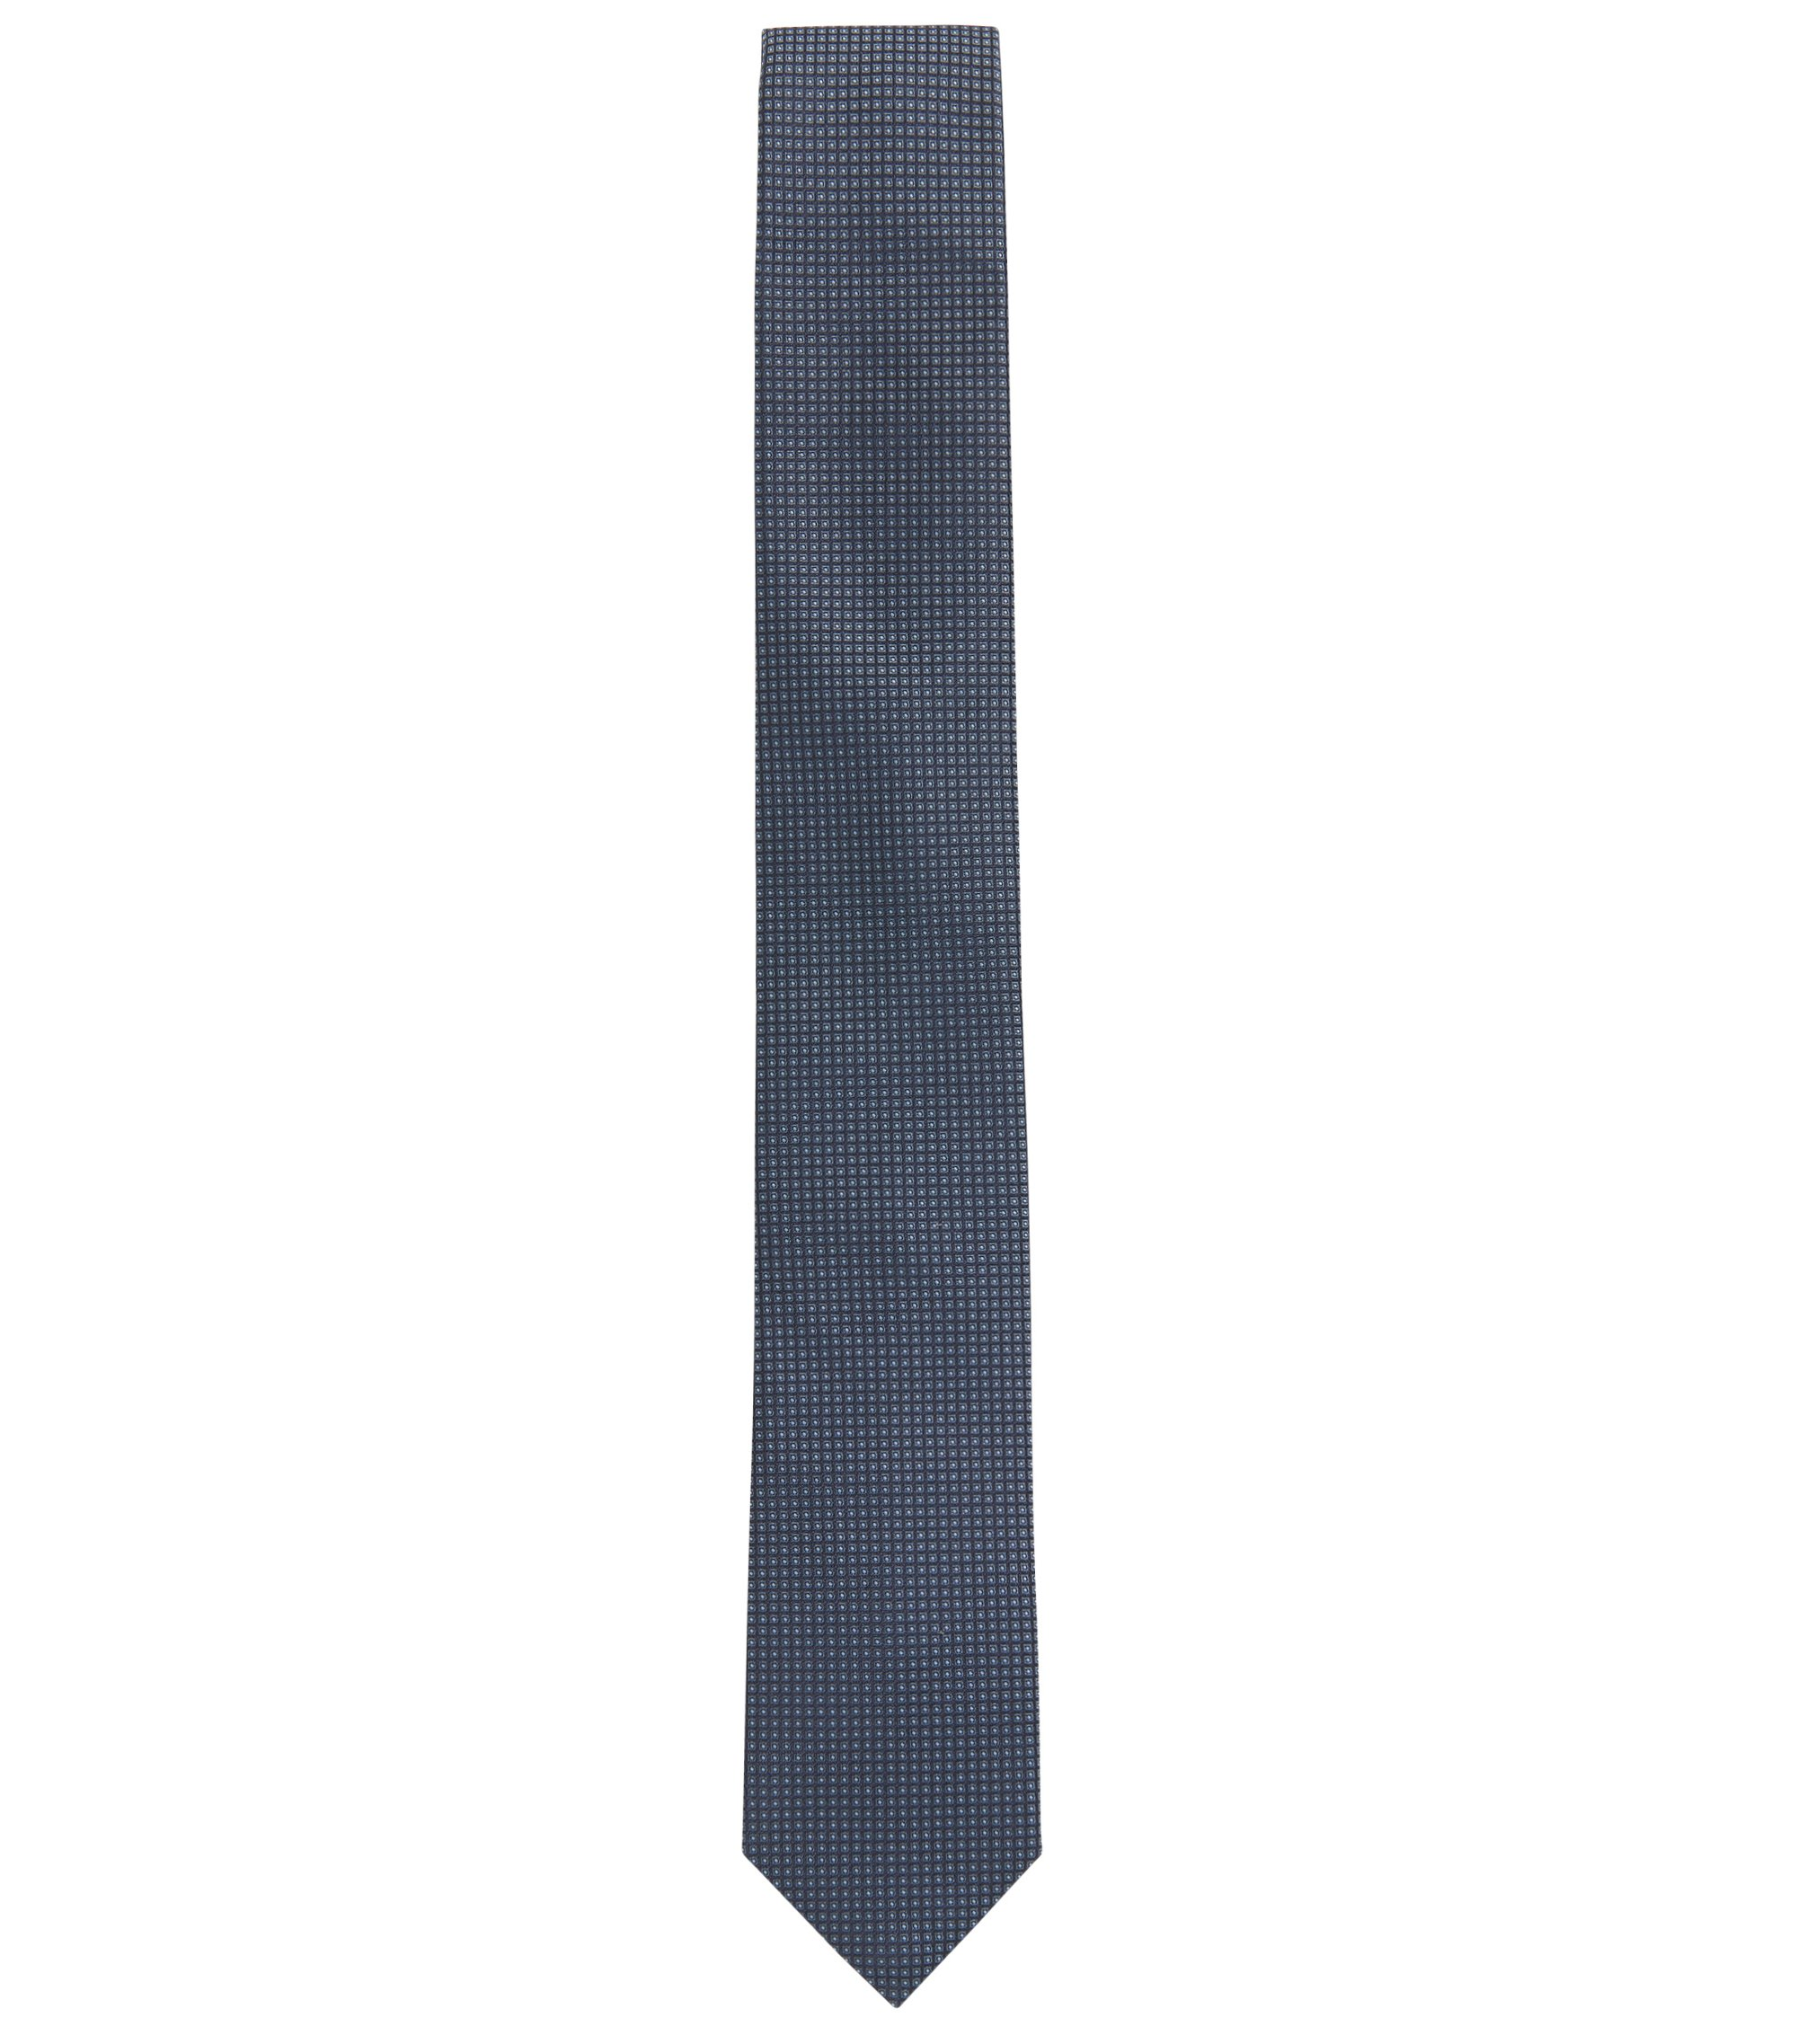 Karierte Krawatte aus Seiden-Jacquard, Hellblau